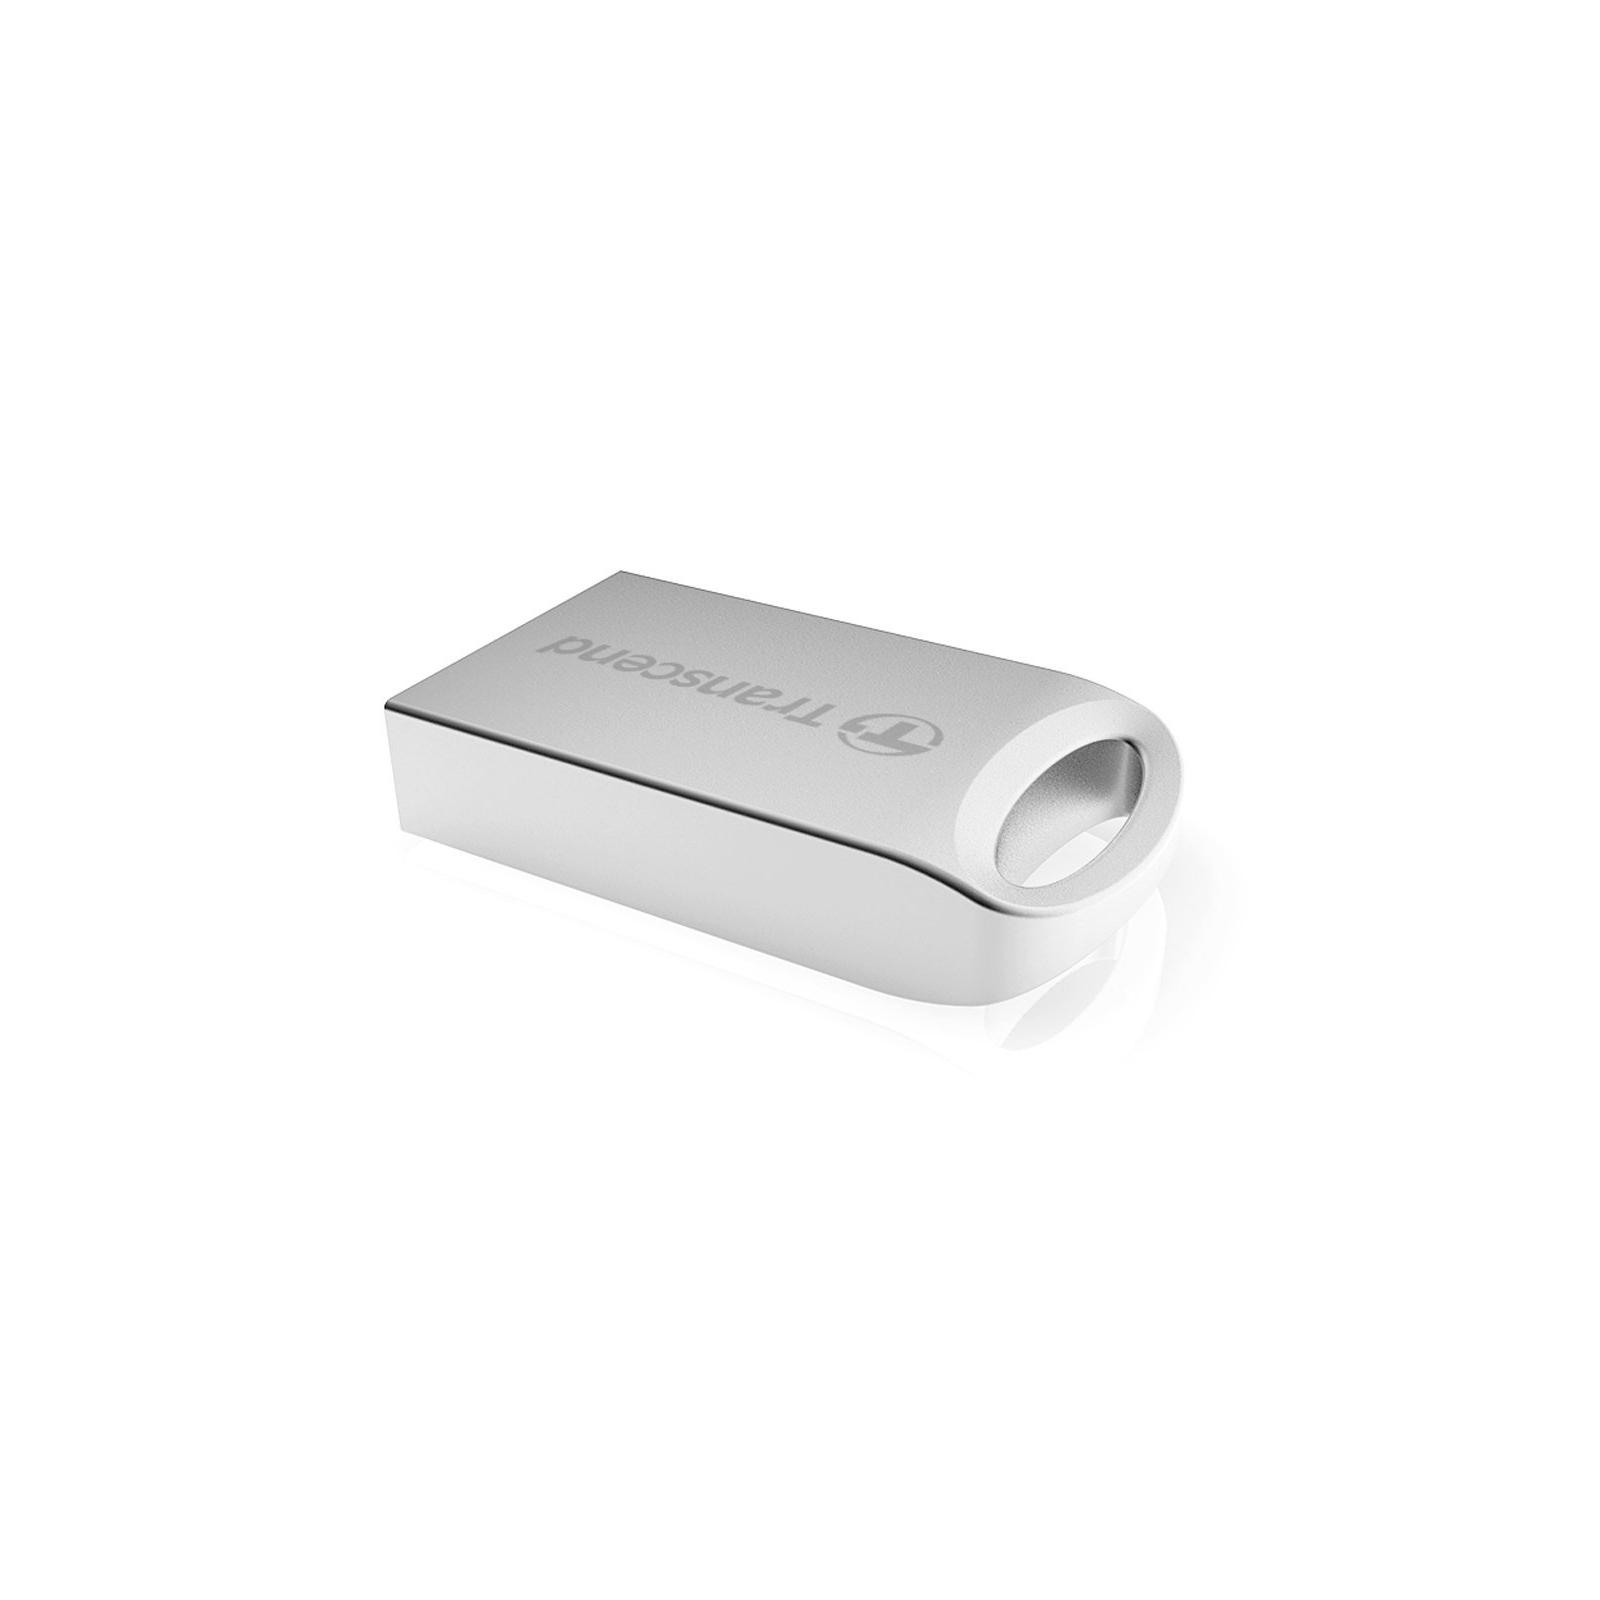 USB флеш накопитель Transcend JetFlash 510, Silver Plating (TS16GJF510S) изображение 2